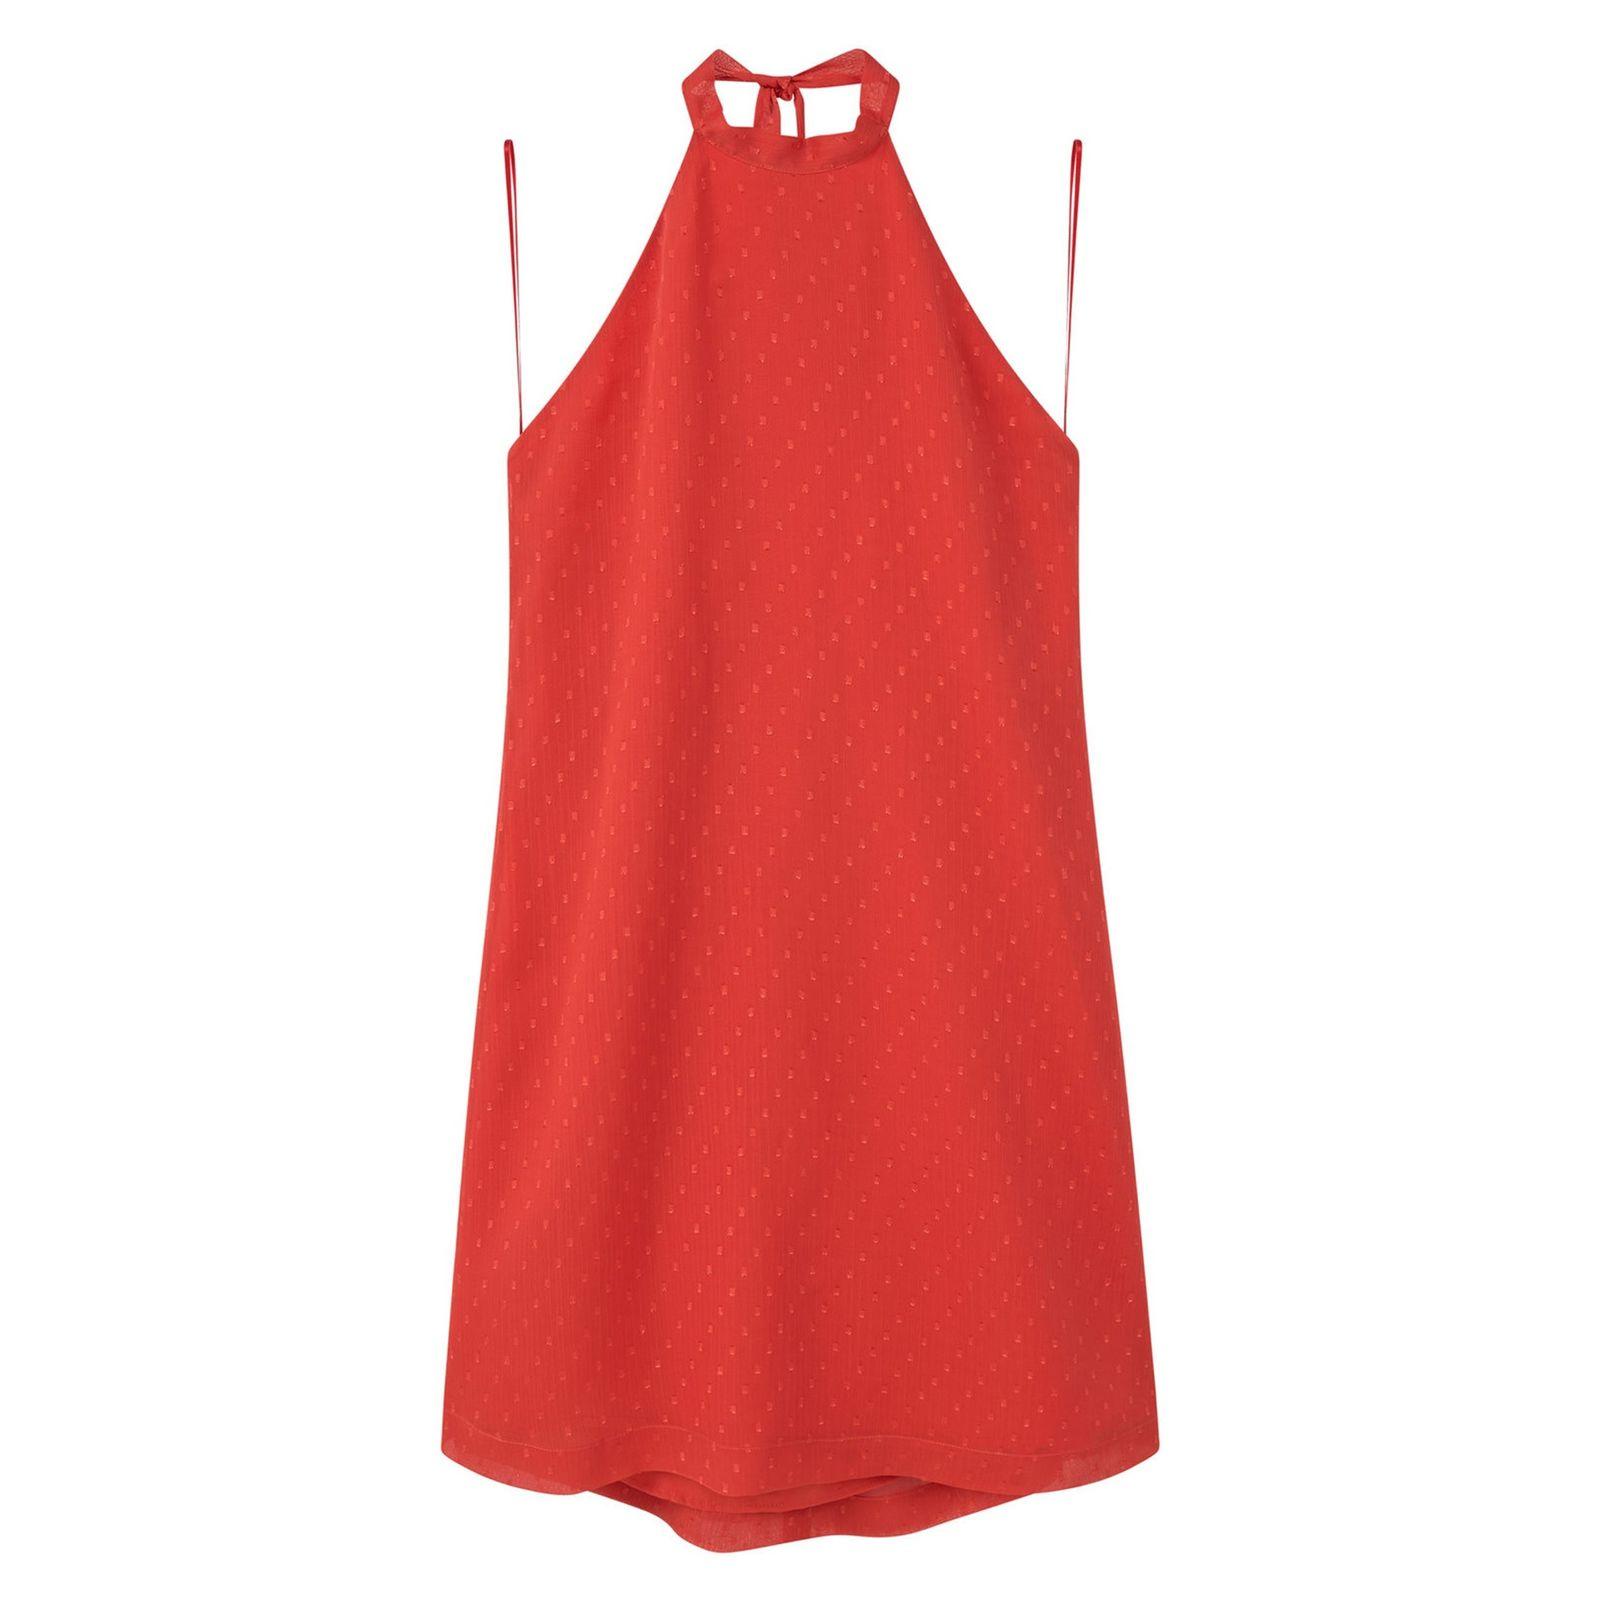 پیراهن کوتاه زنانه - مانگو - گوجه اي - 1